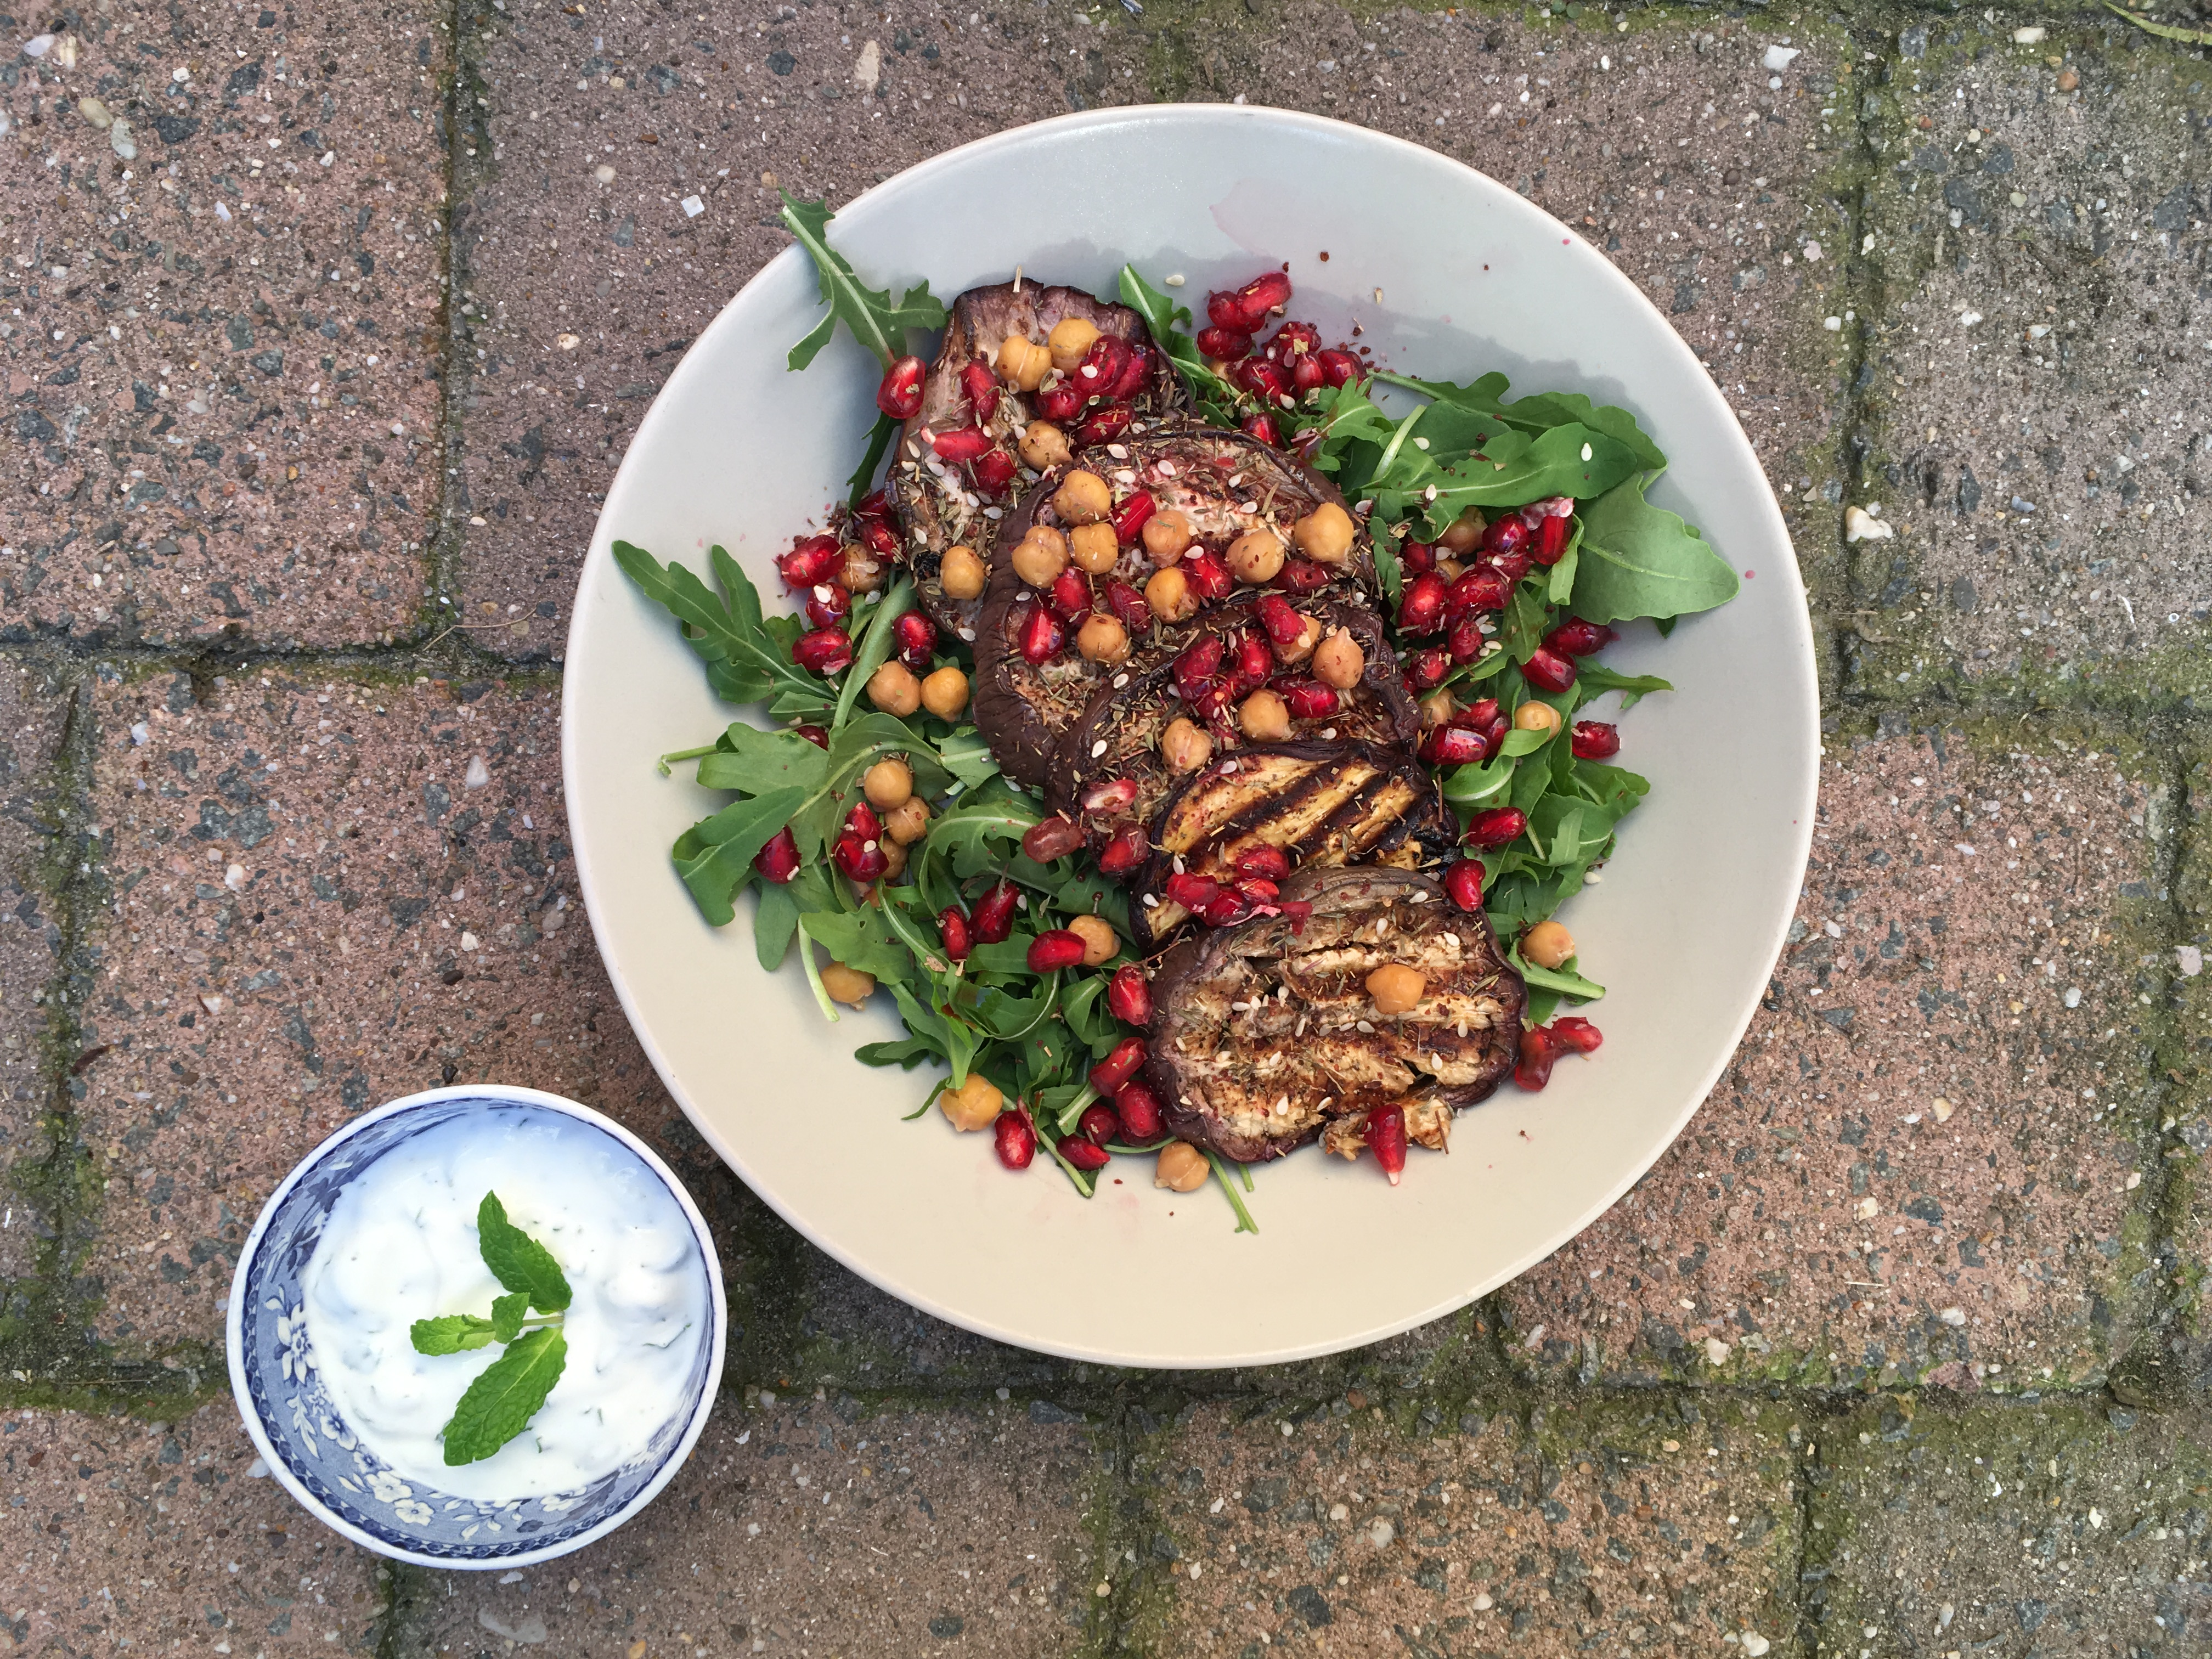 Salade met gegrilde aubergine, kikkererwten en granaatappel - Julienne